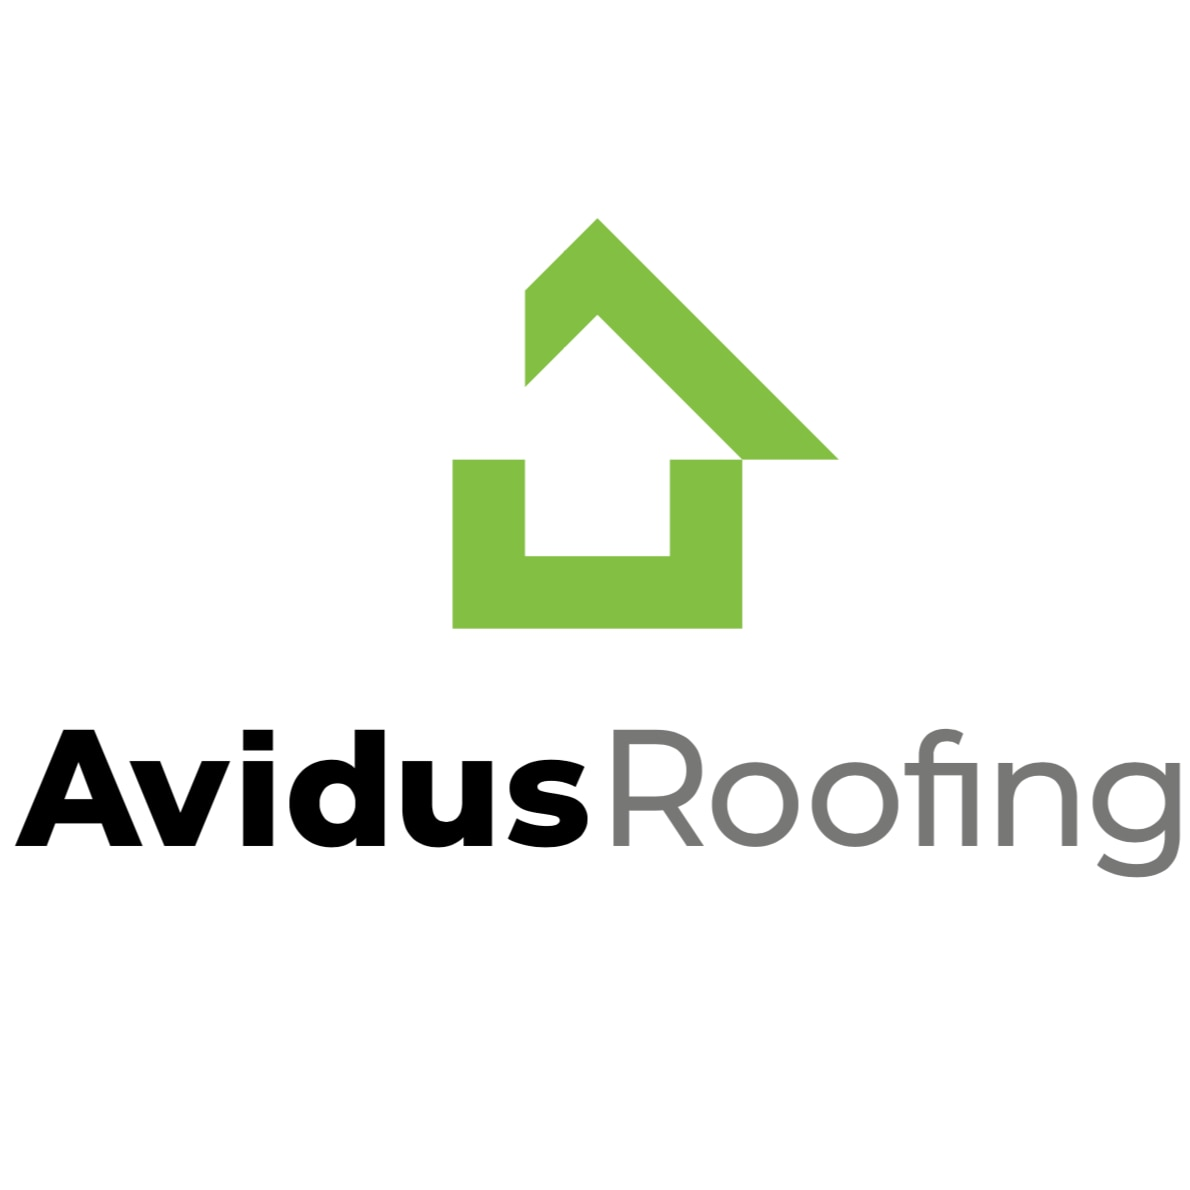 Avidus Roofing